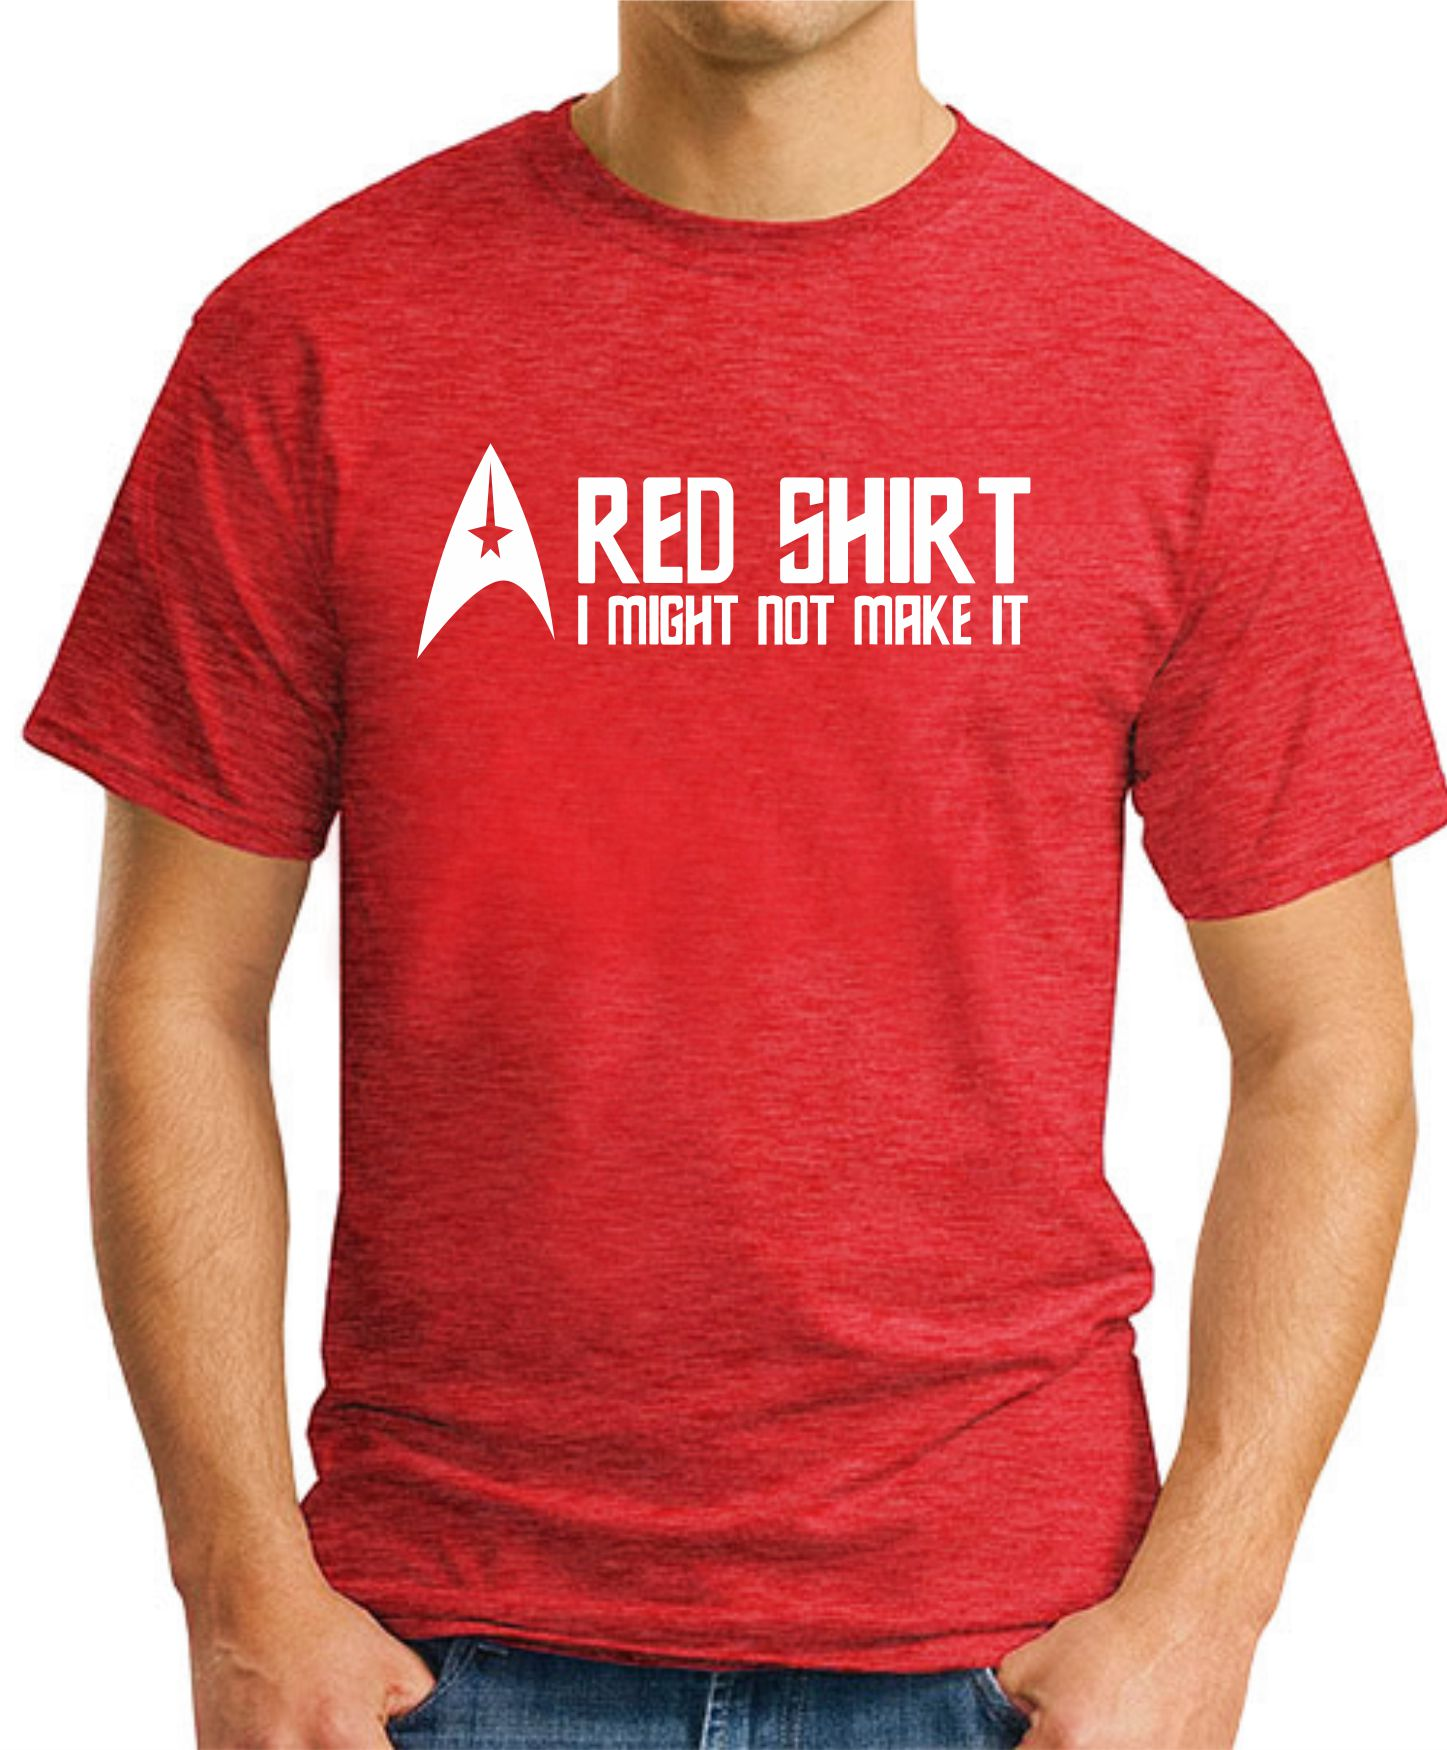 STAR TREK RED SHIRT Red